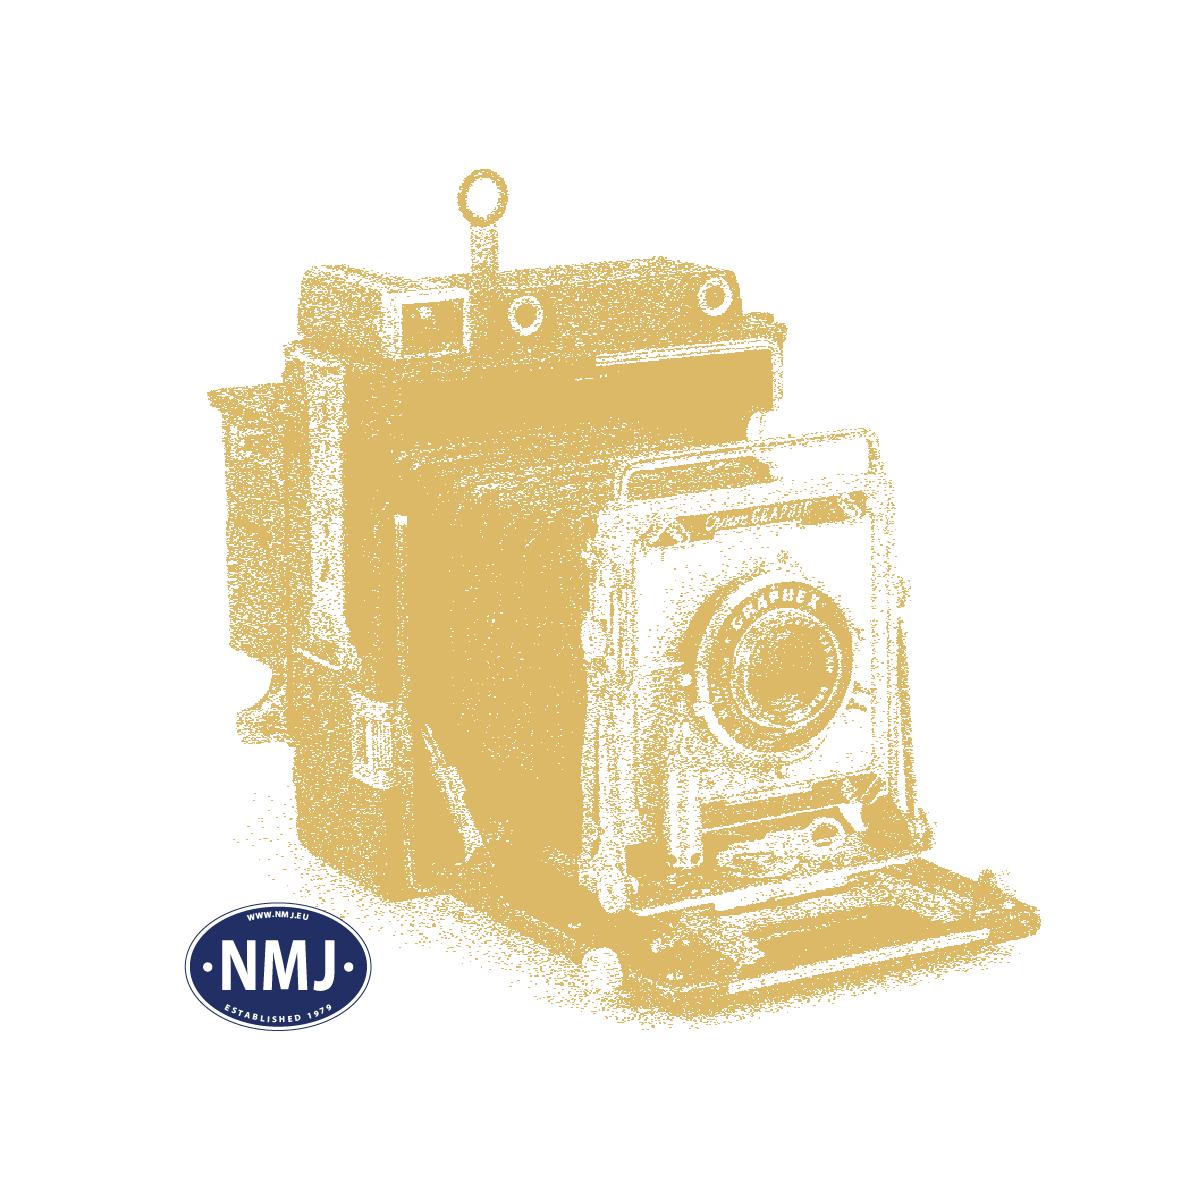 NMJT90304 - NMJ Topline CFL 1601 (1956-1971), DC